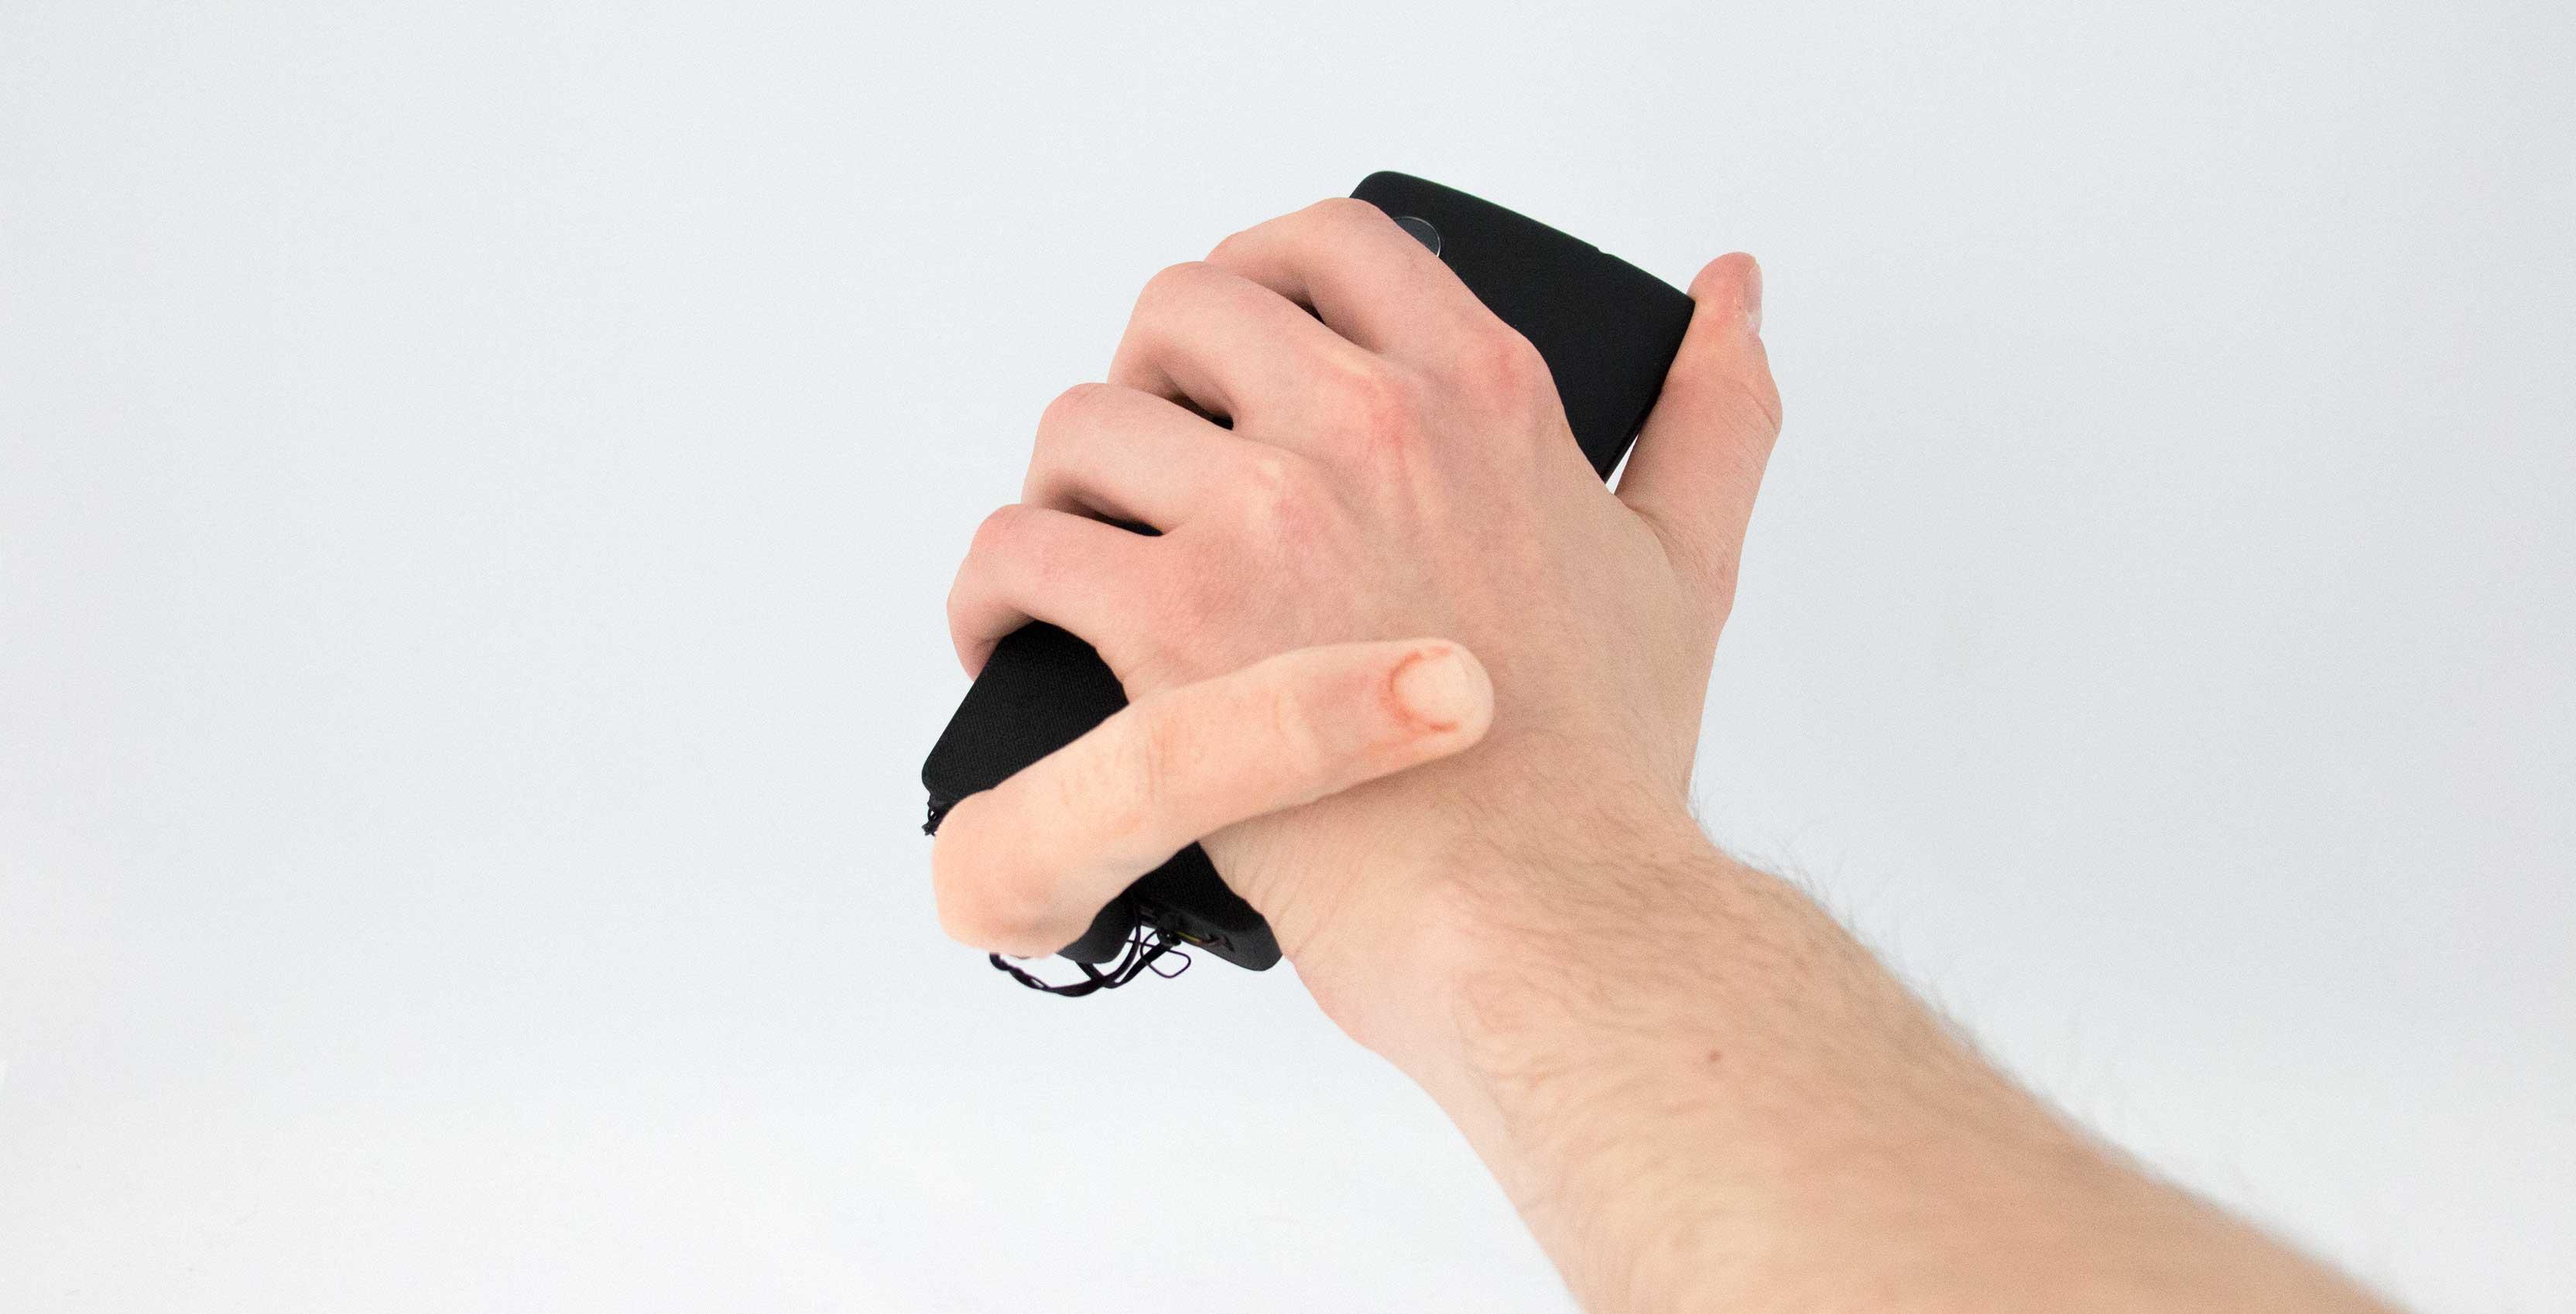 MobiLimb hand